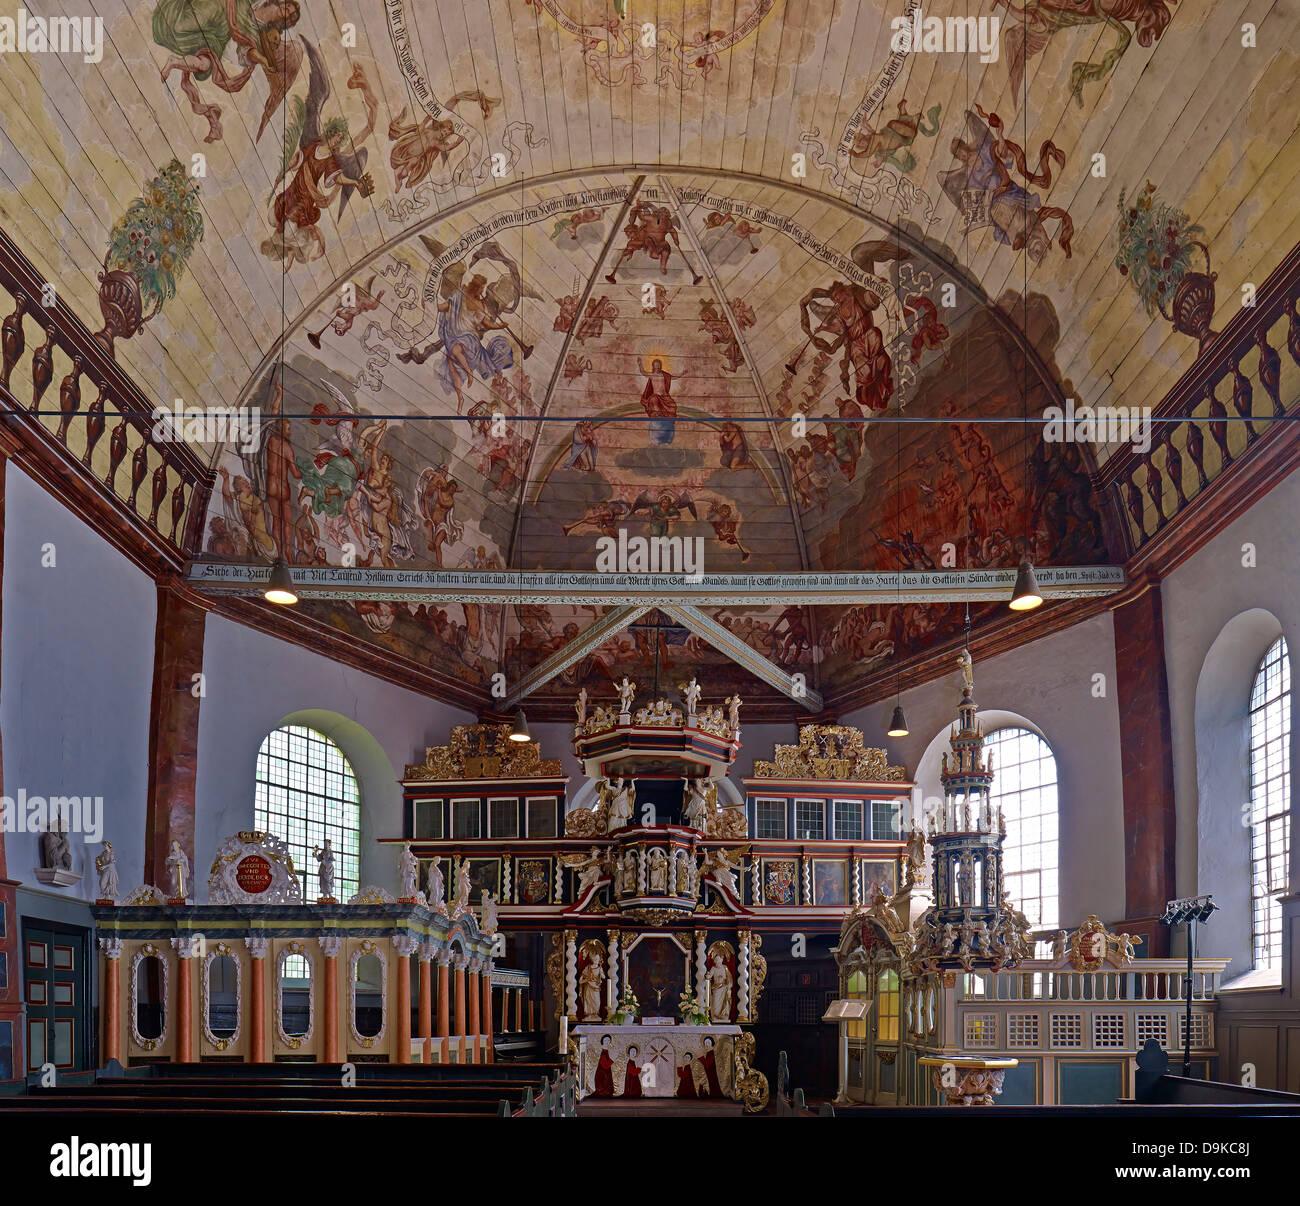 Interior with altar, St. Pankratius Church, Neuenfelde, Altes Land, Hamburg, Germany - Stock Image